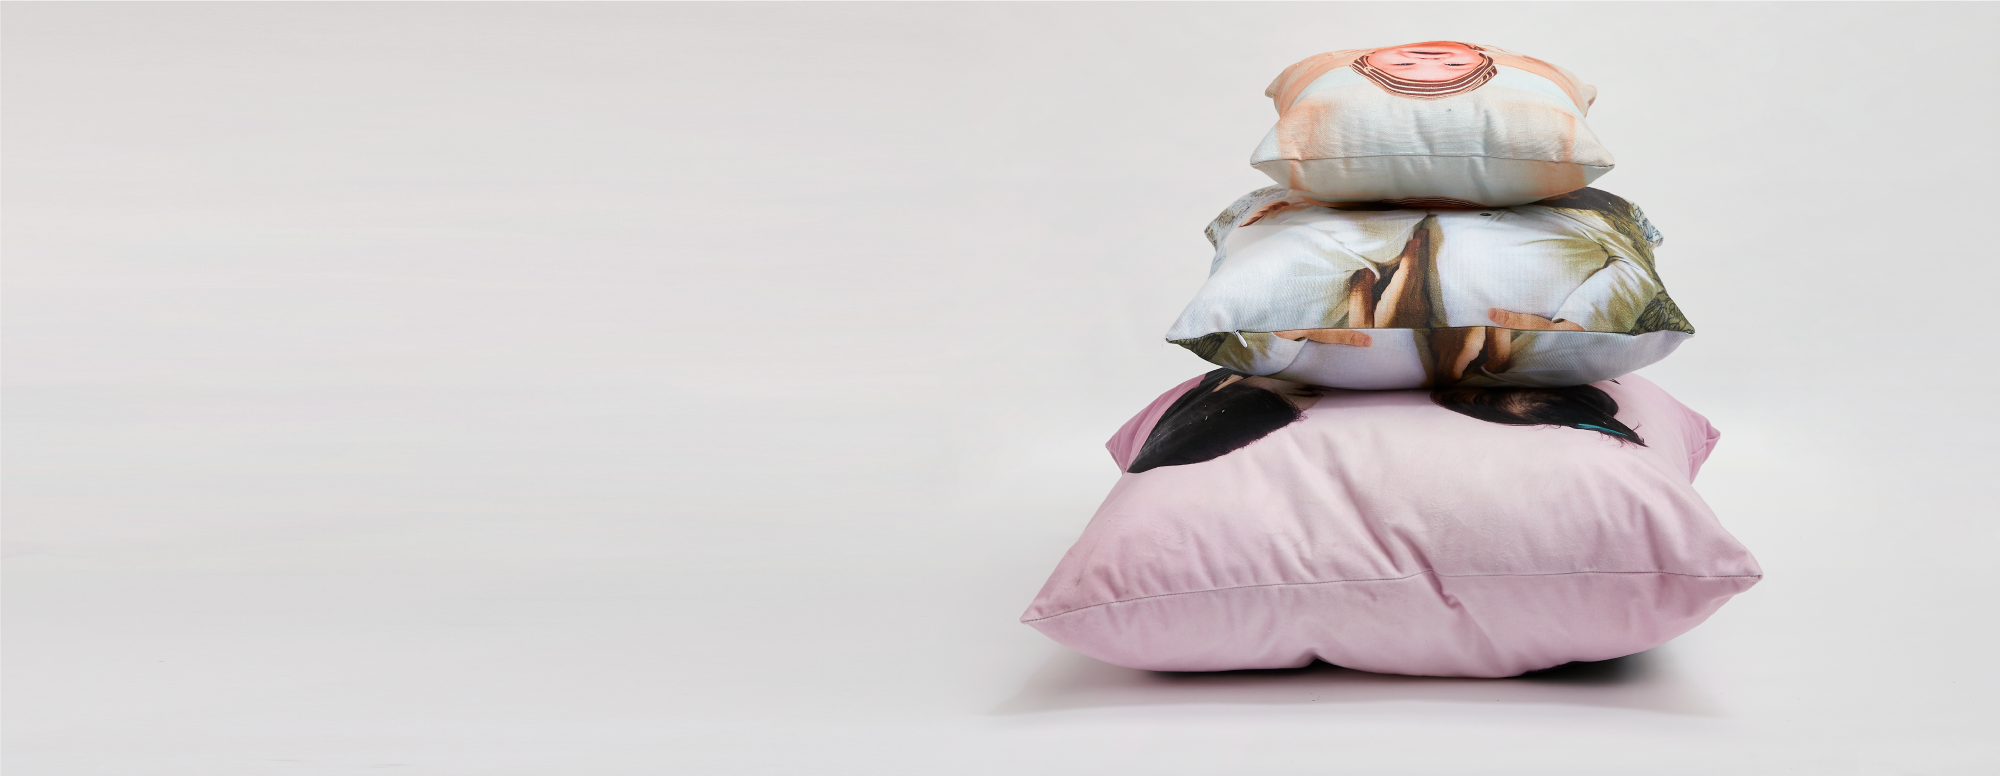 Commission Print Cushions Any Design